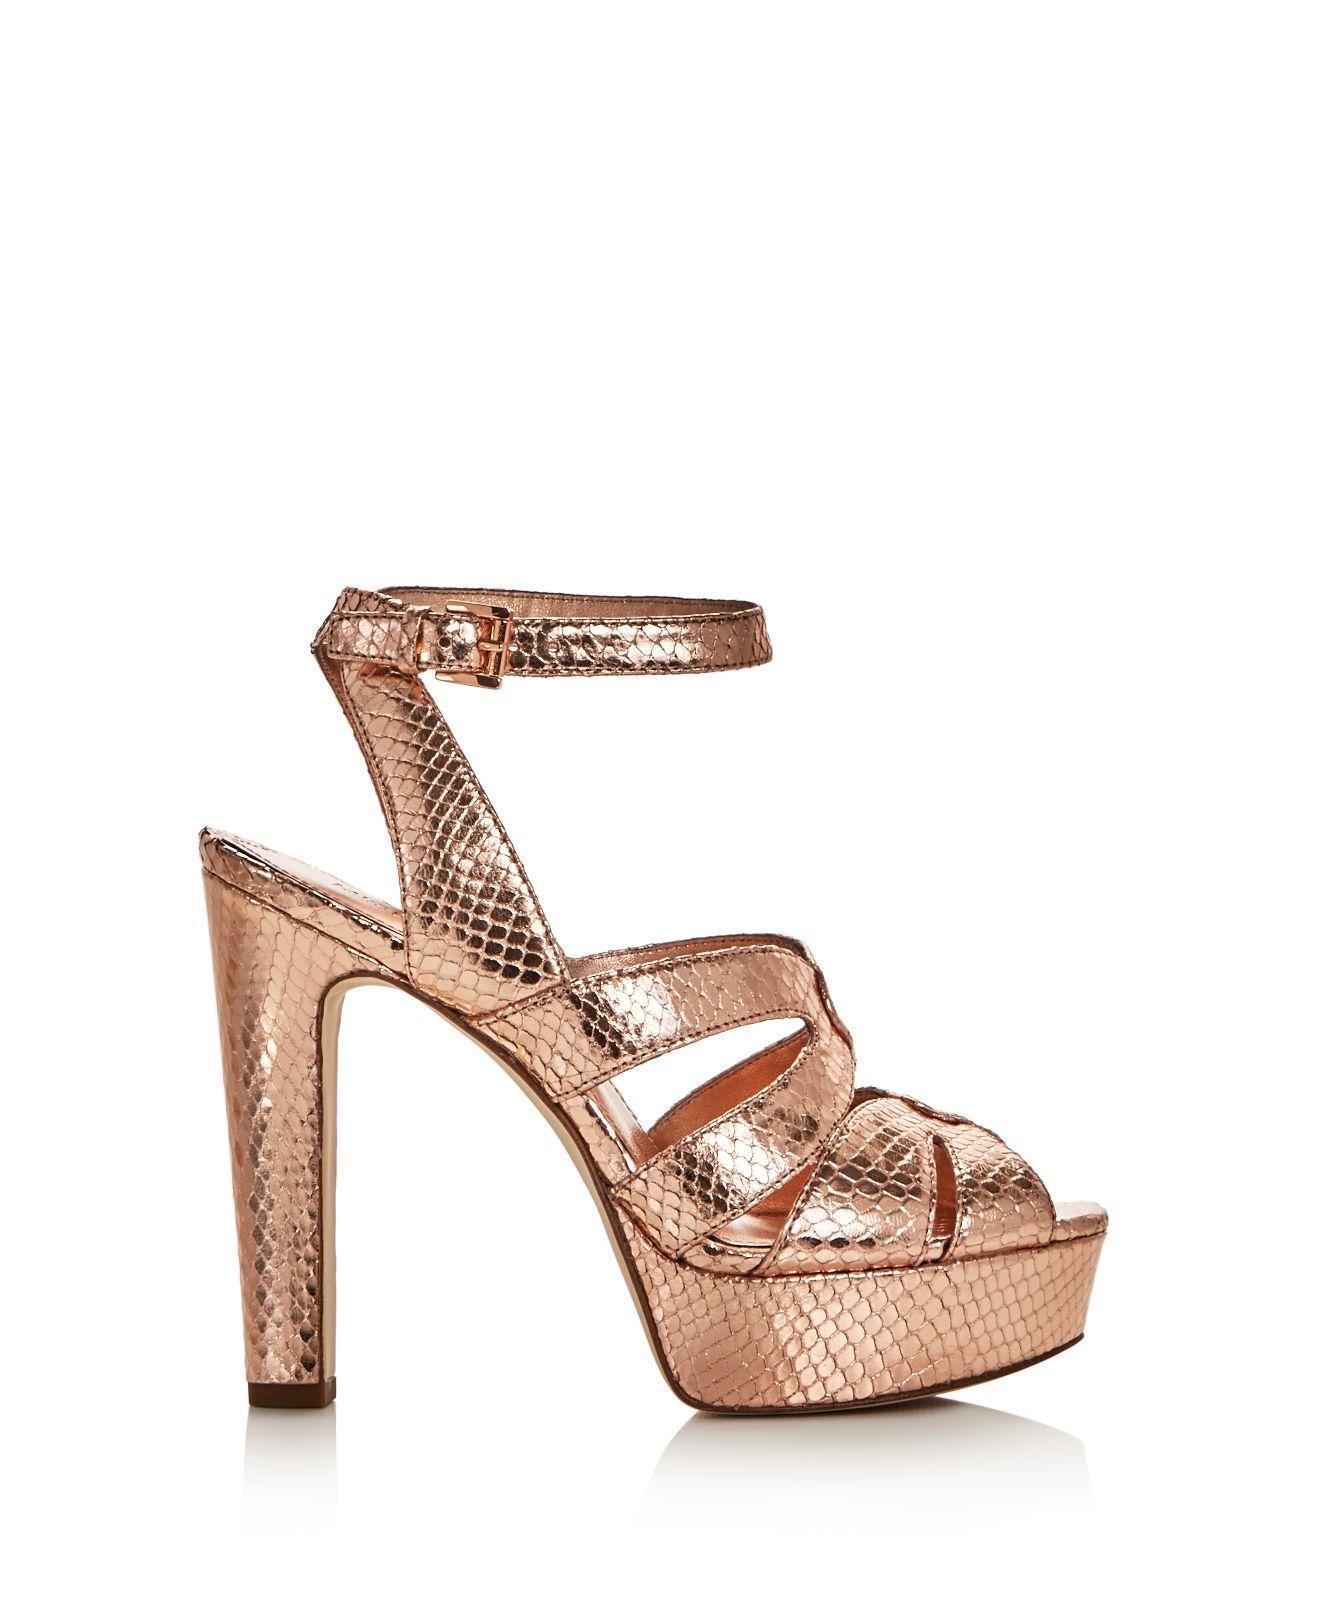 8c3e4d34e34a MICHAEL Michael Kors Winona Snake Embossed Metallic High Heel ...